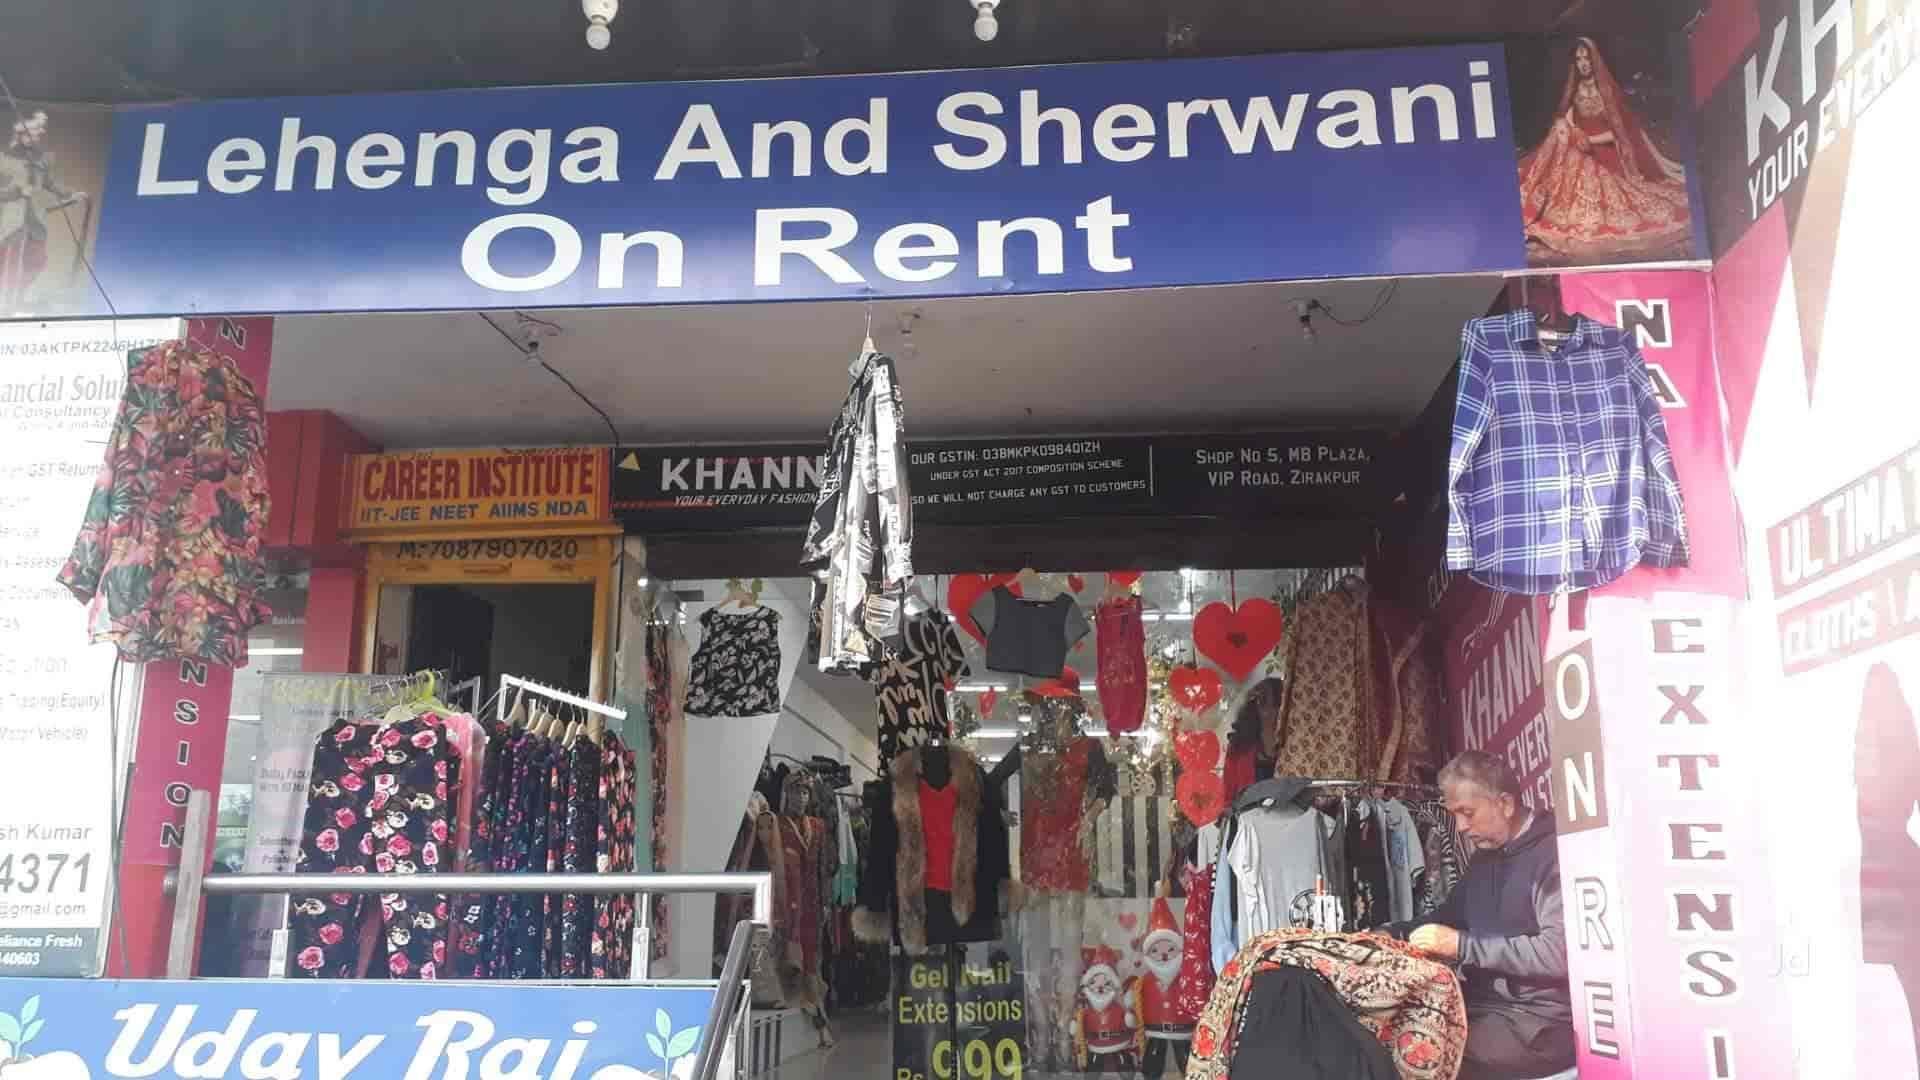 Khanna's, Near Reliance Fresh - Wedding Readymade Garments On Hire